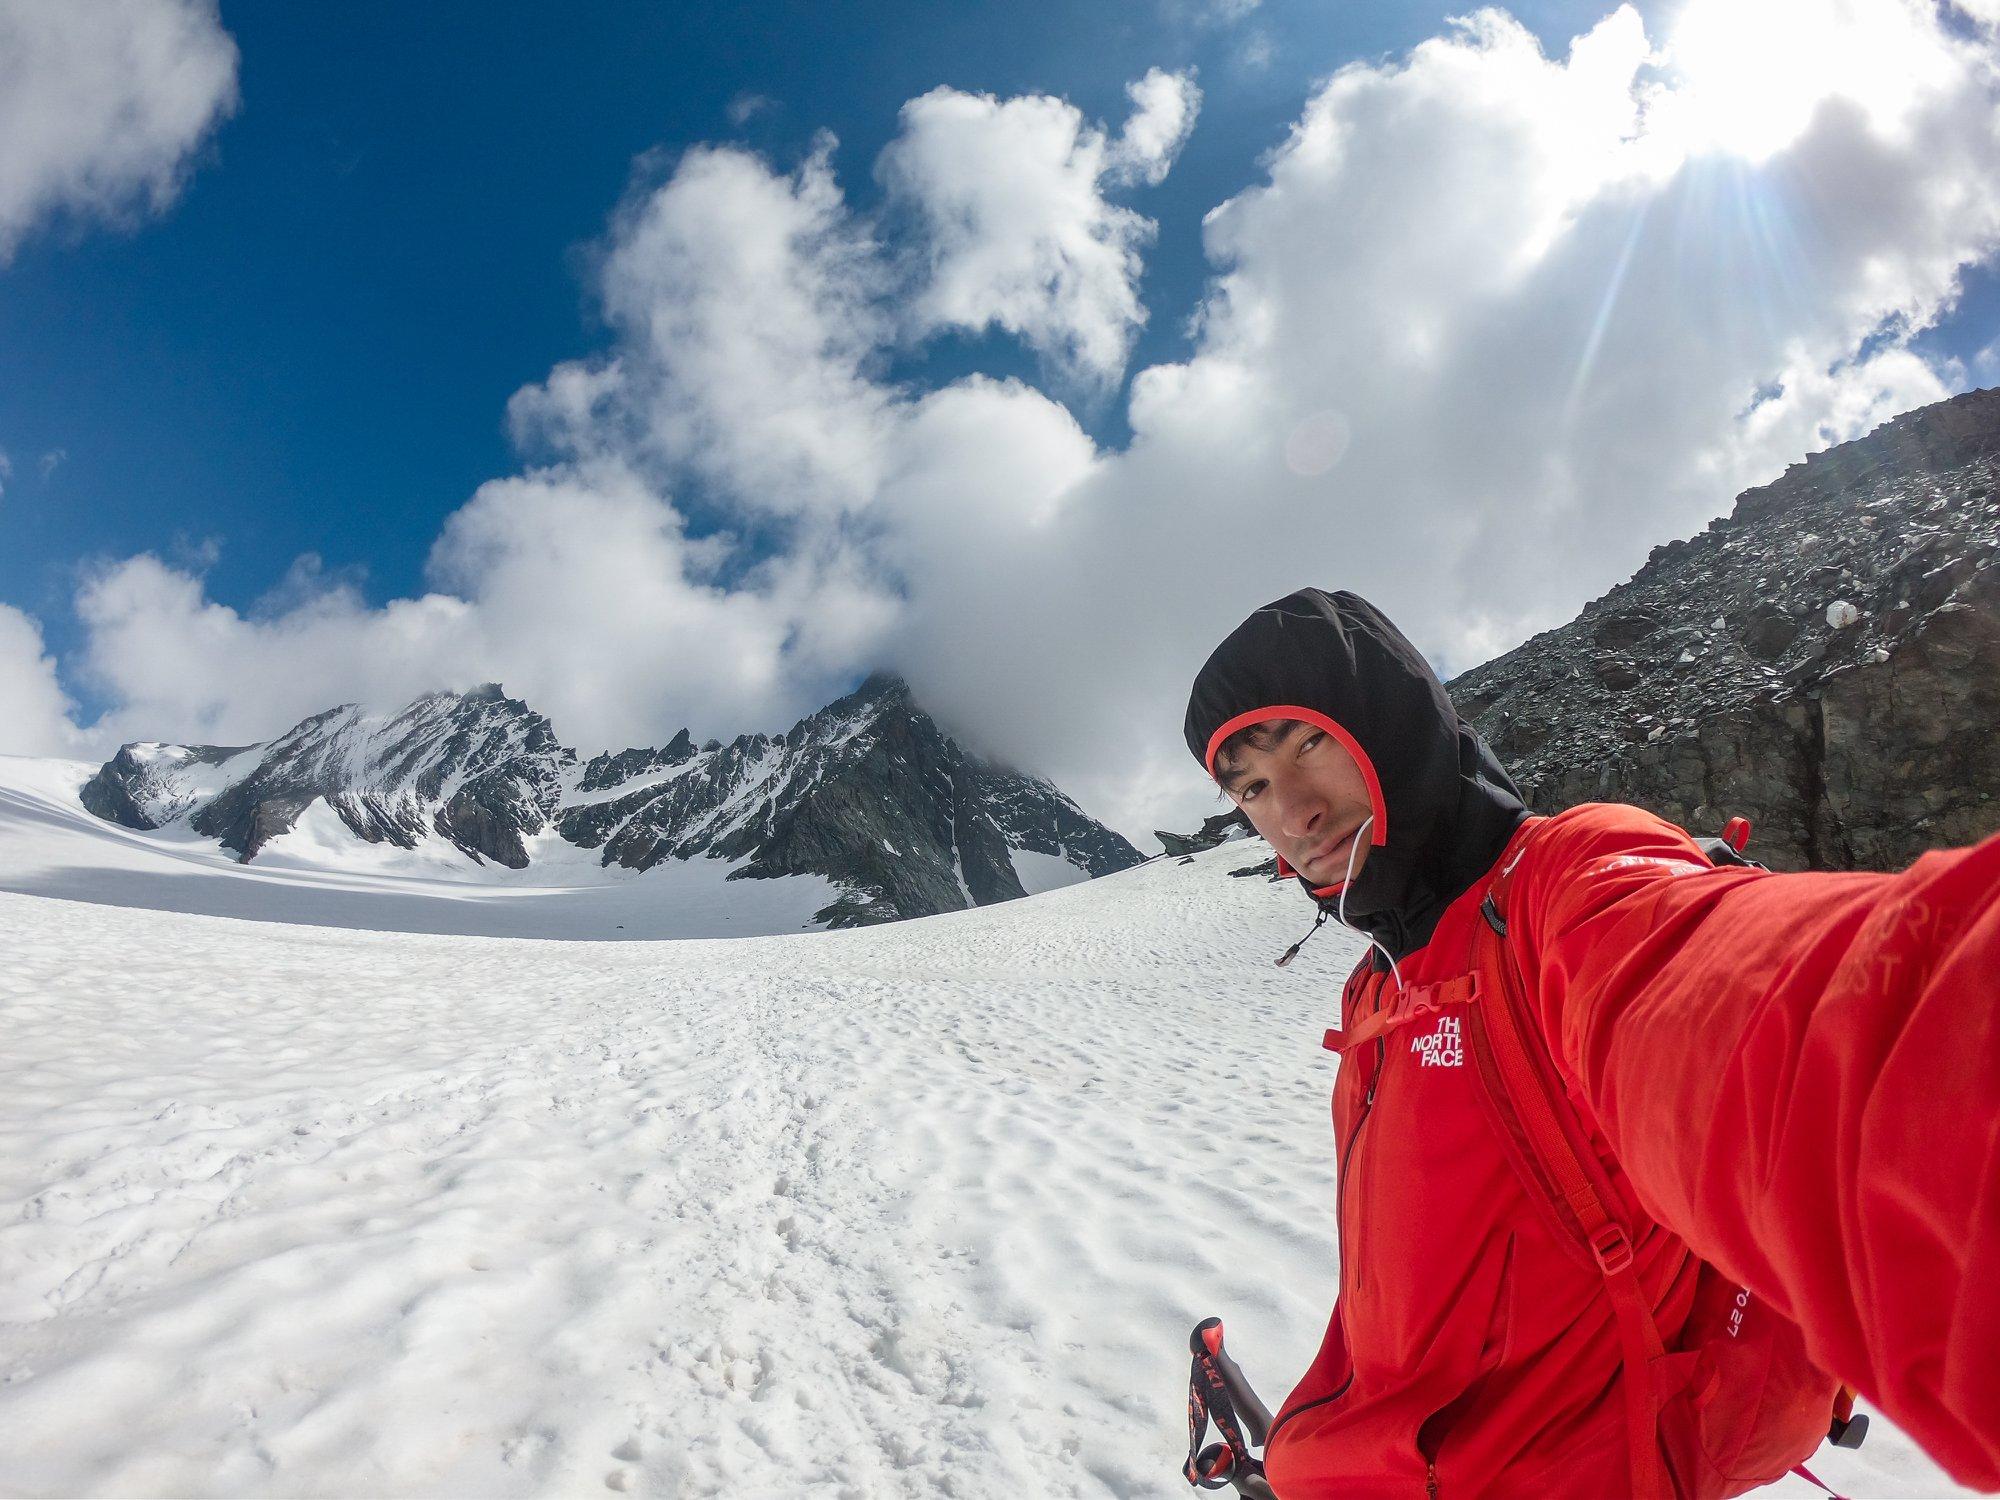 Lunag-ri, alpinismo, Himalaya, David Lama, Conrad Anker